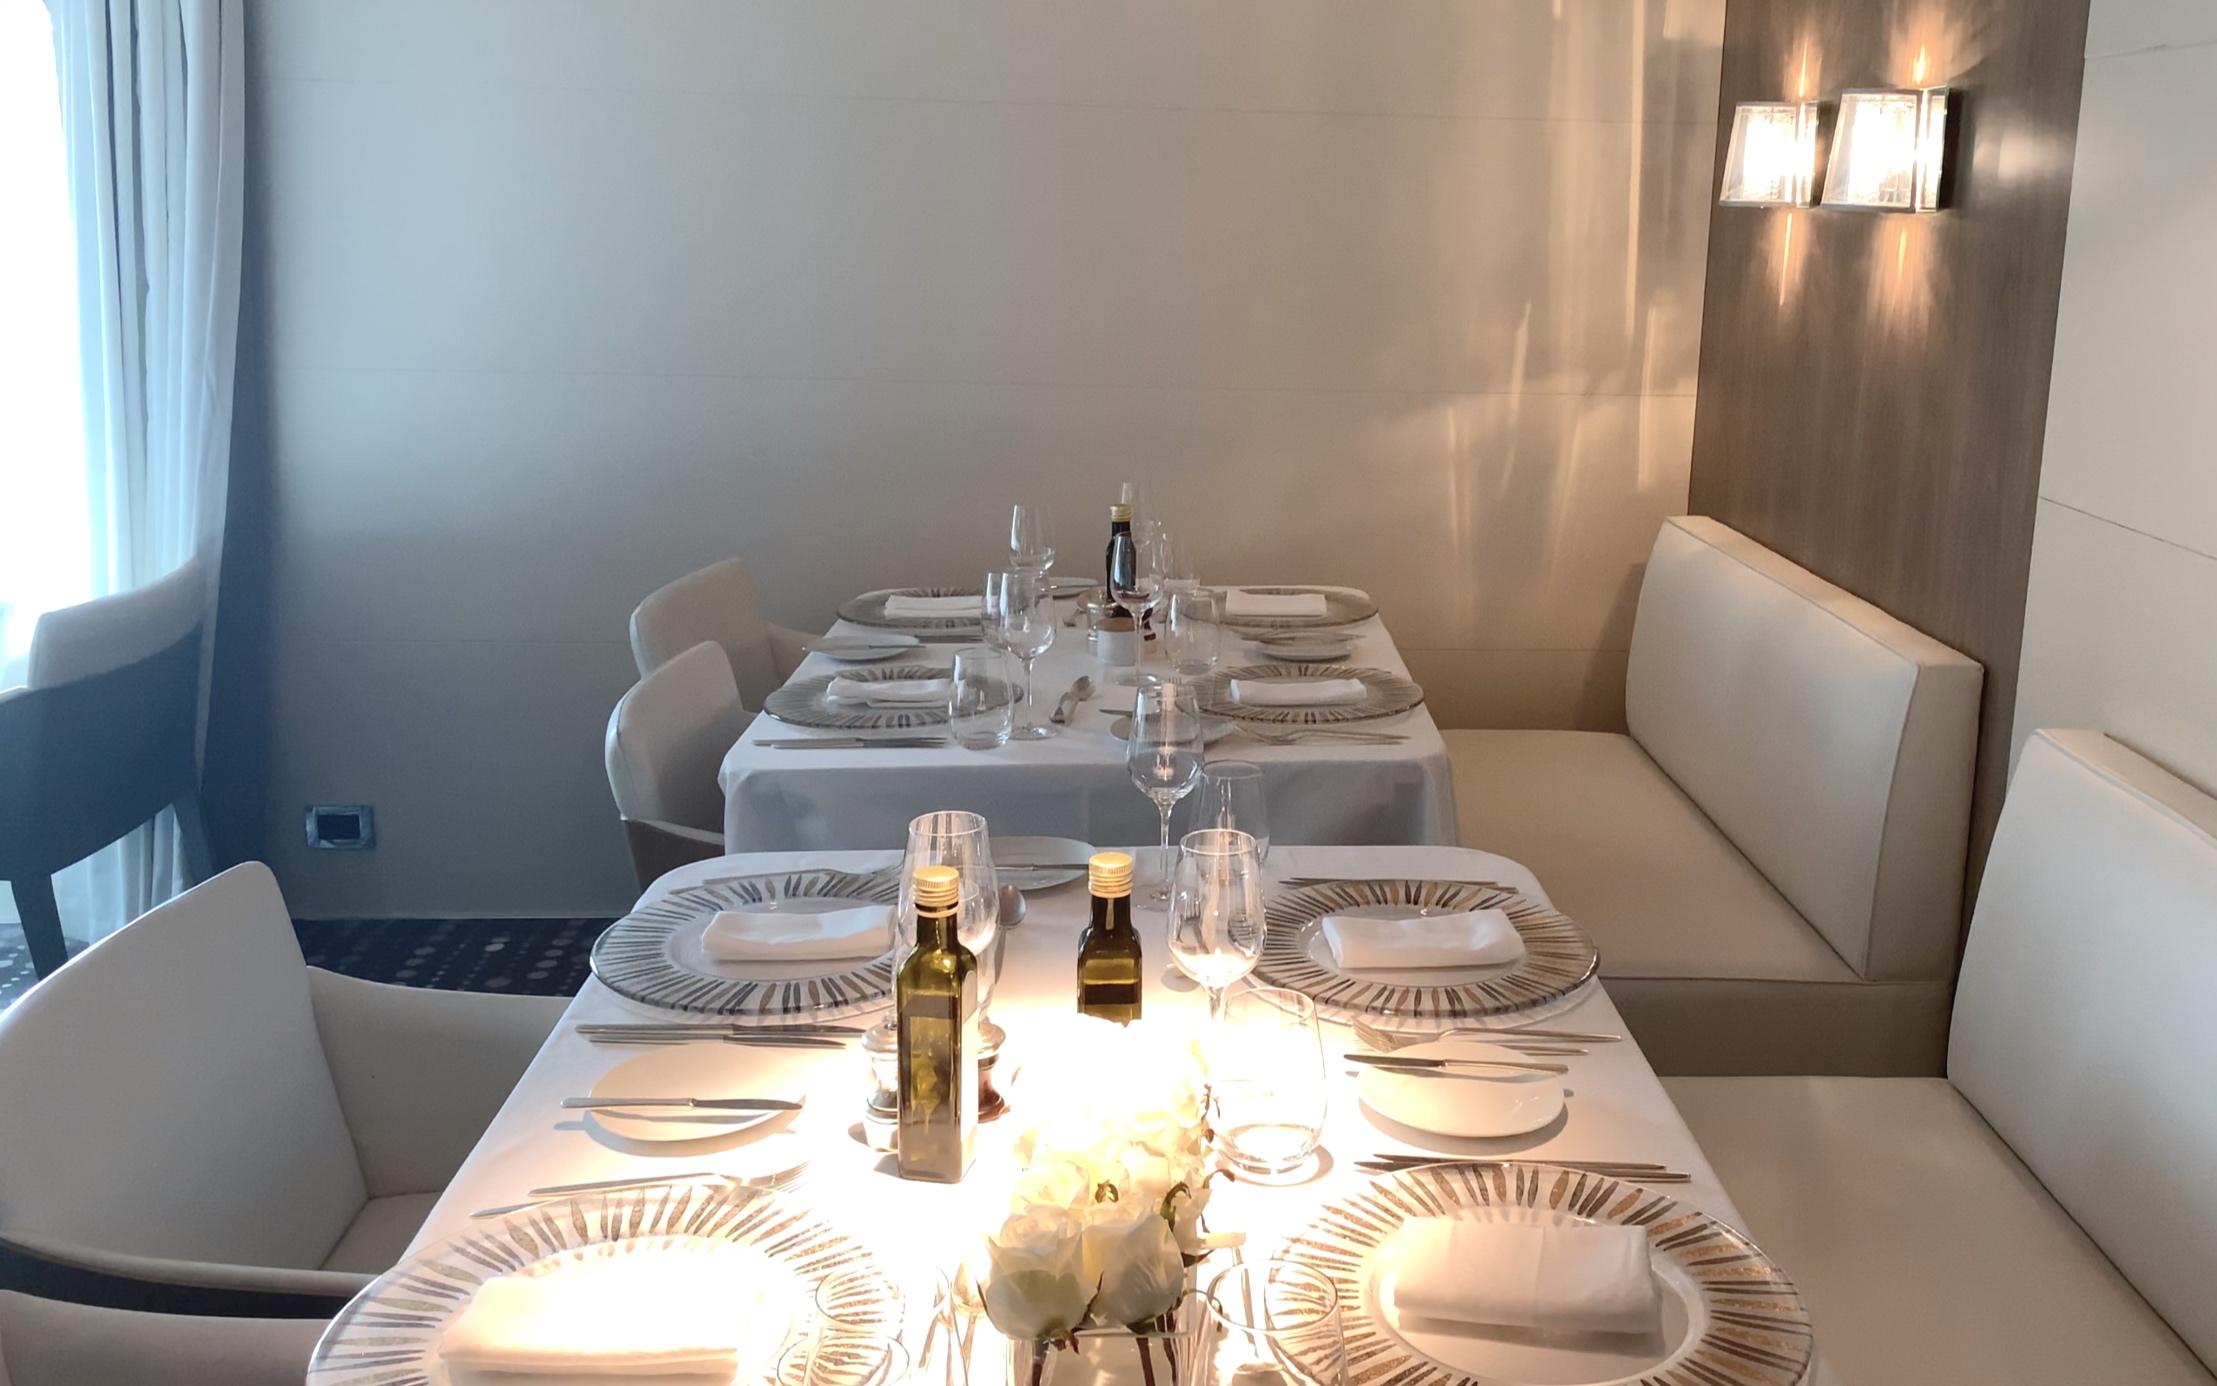 Lovely tableware and lighting.